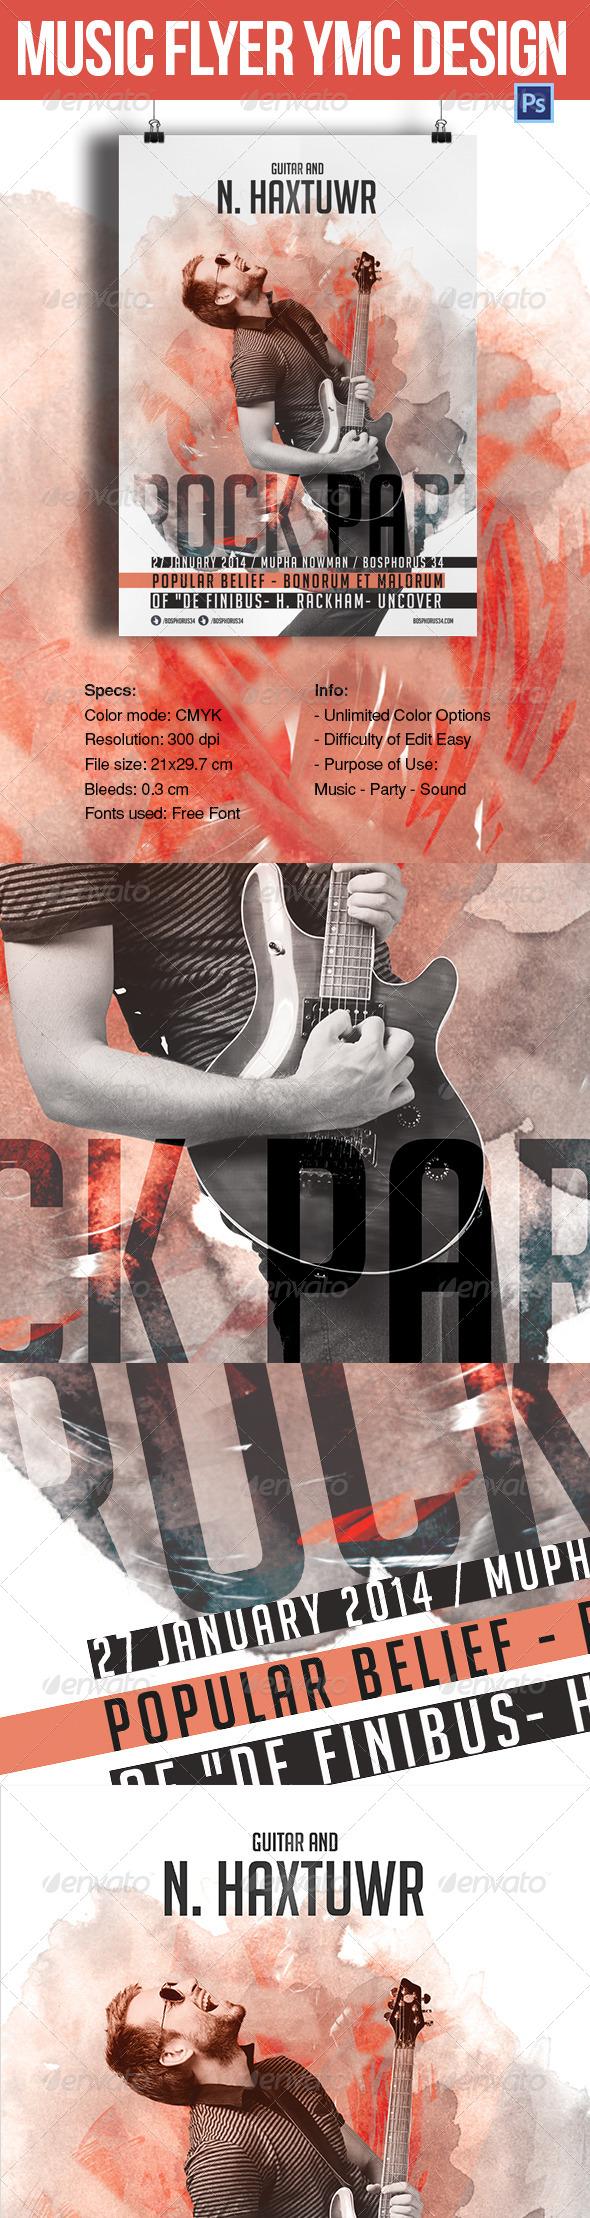 Music Flyer YMC Design - Concerts Events